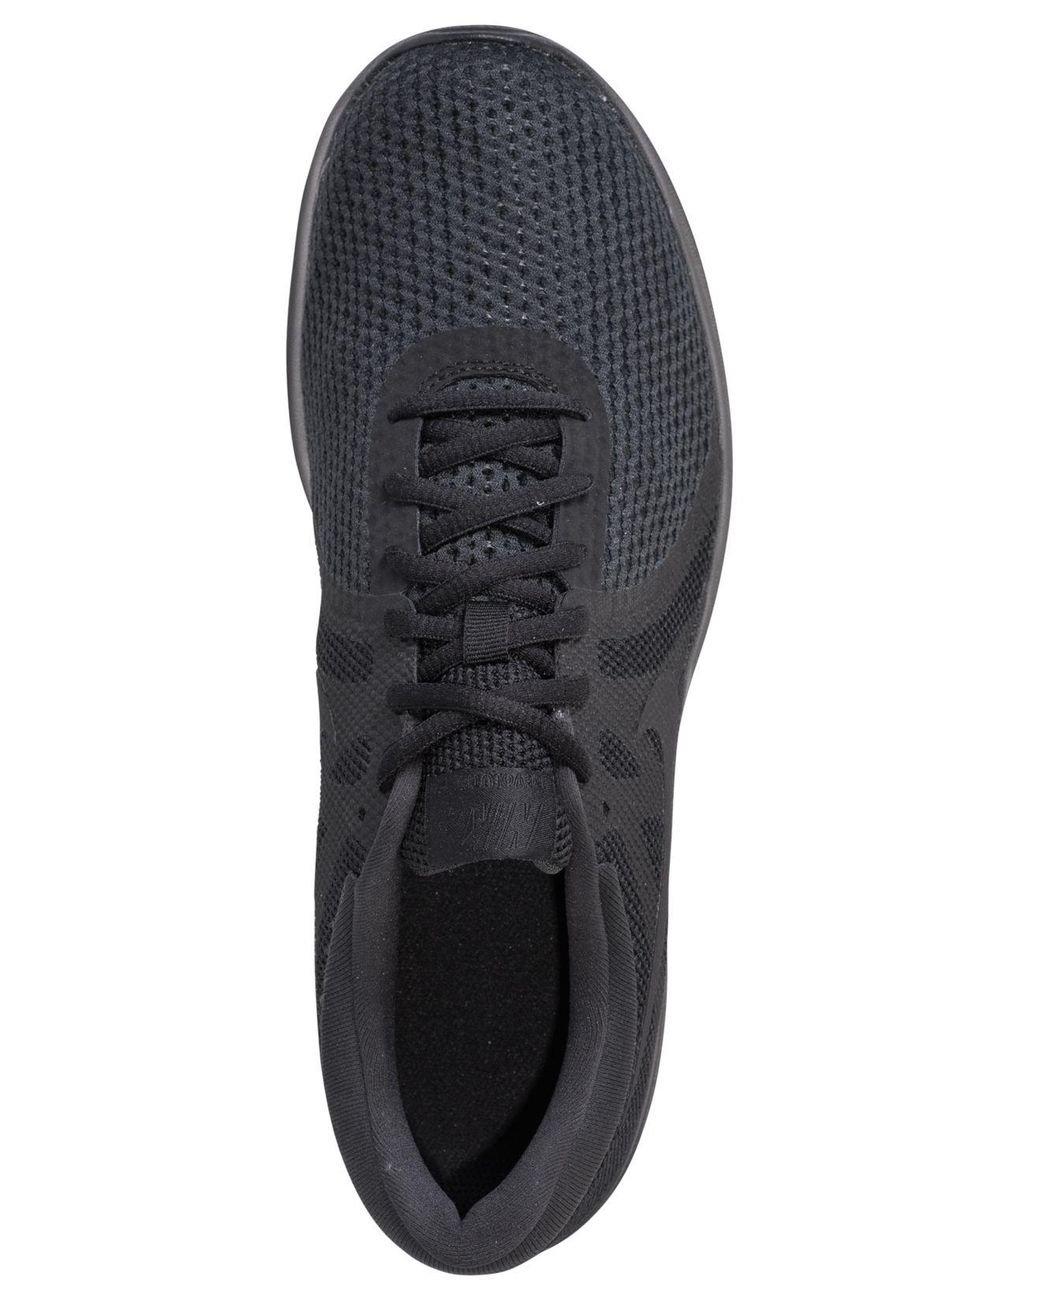 b05ff59cb85b4 Men's Black Revolution 4 Competition Running Shoes